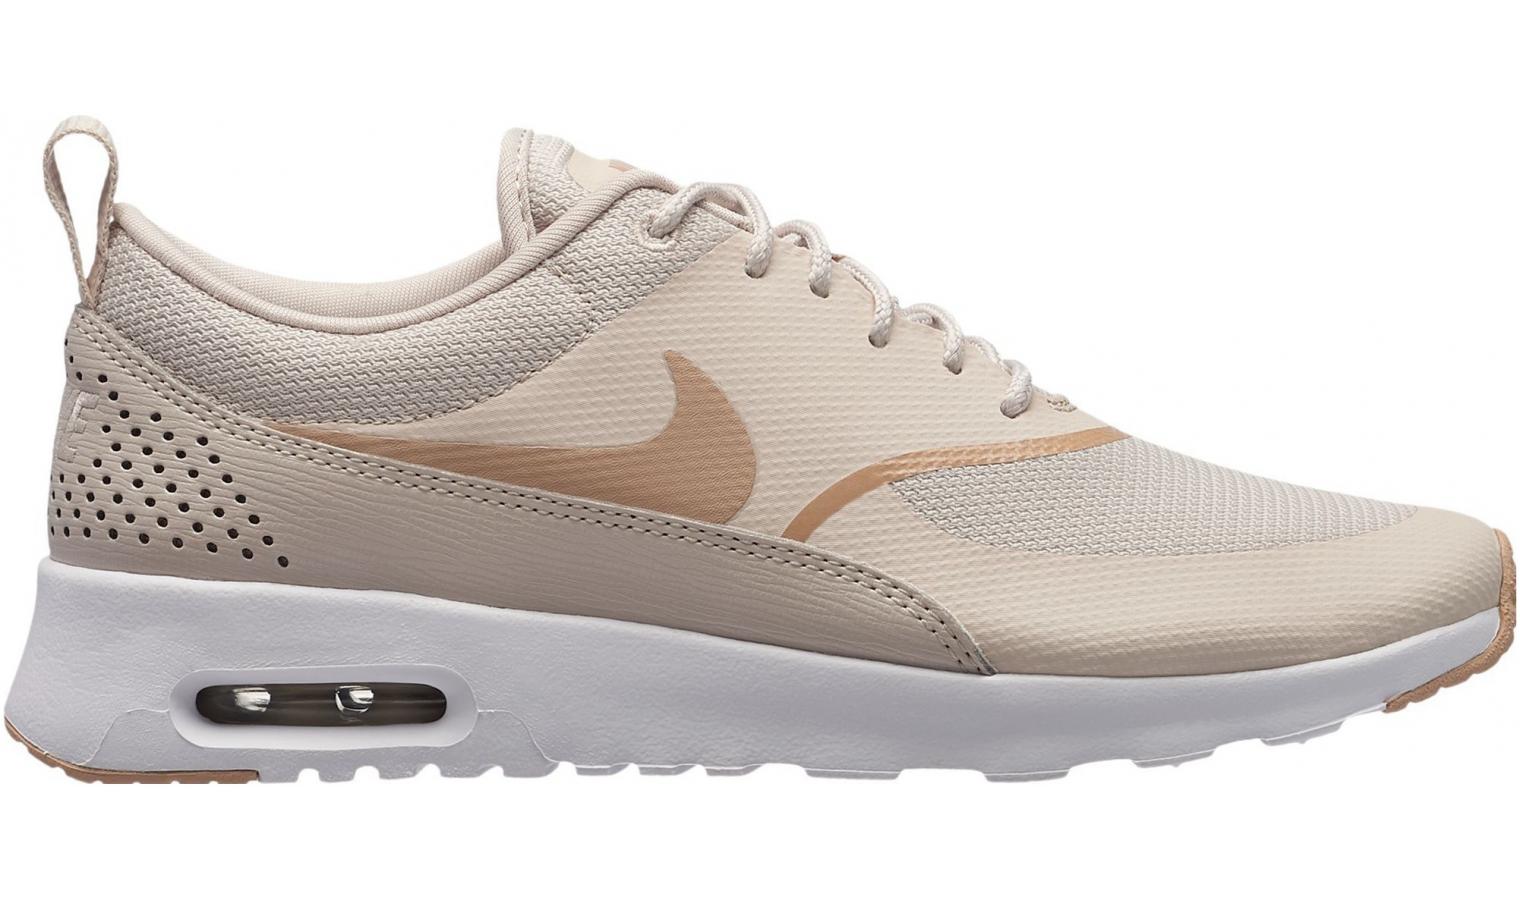 7e7604548149 ... Dámske tenisky Nike AIR MAX THEA SHOE W béžove. 0 EUR Zľava